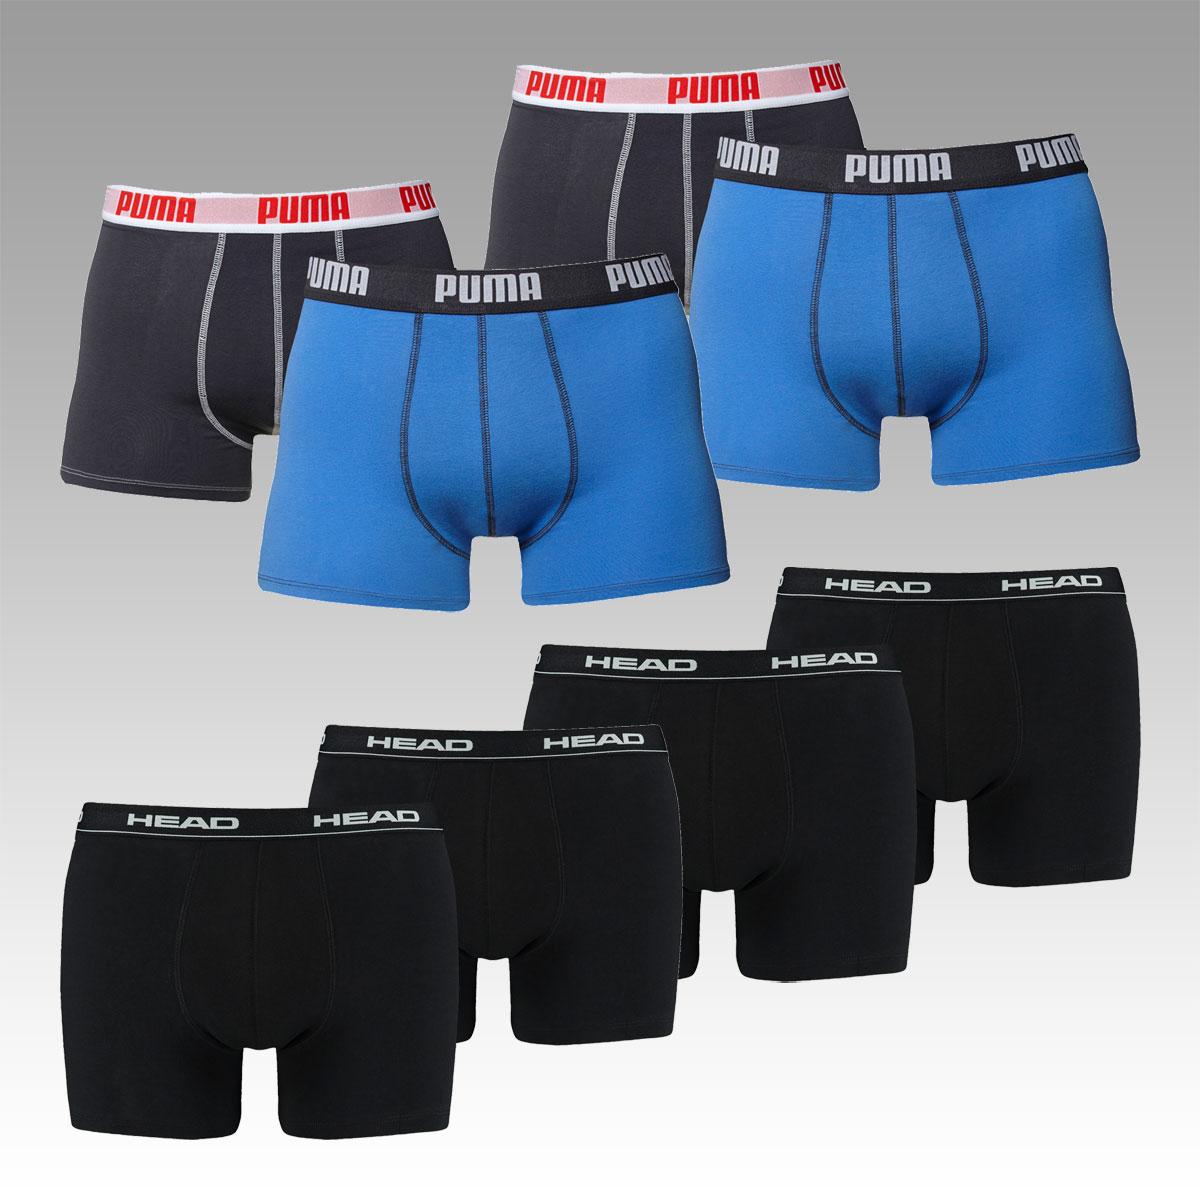 Boxershorts-Konglomerat: 8er Pack HEAD oder PUMA Buchsen ab 23,95 €